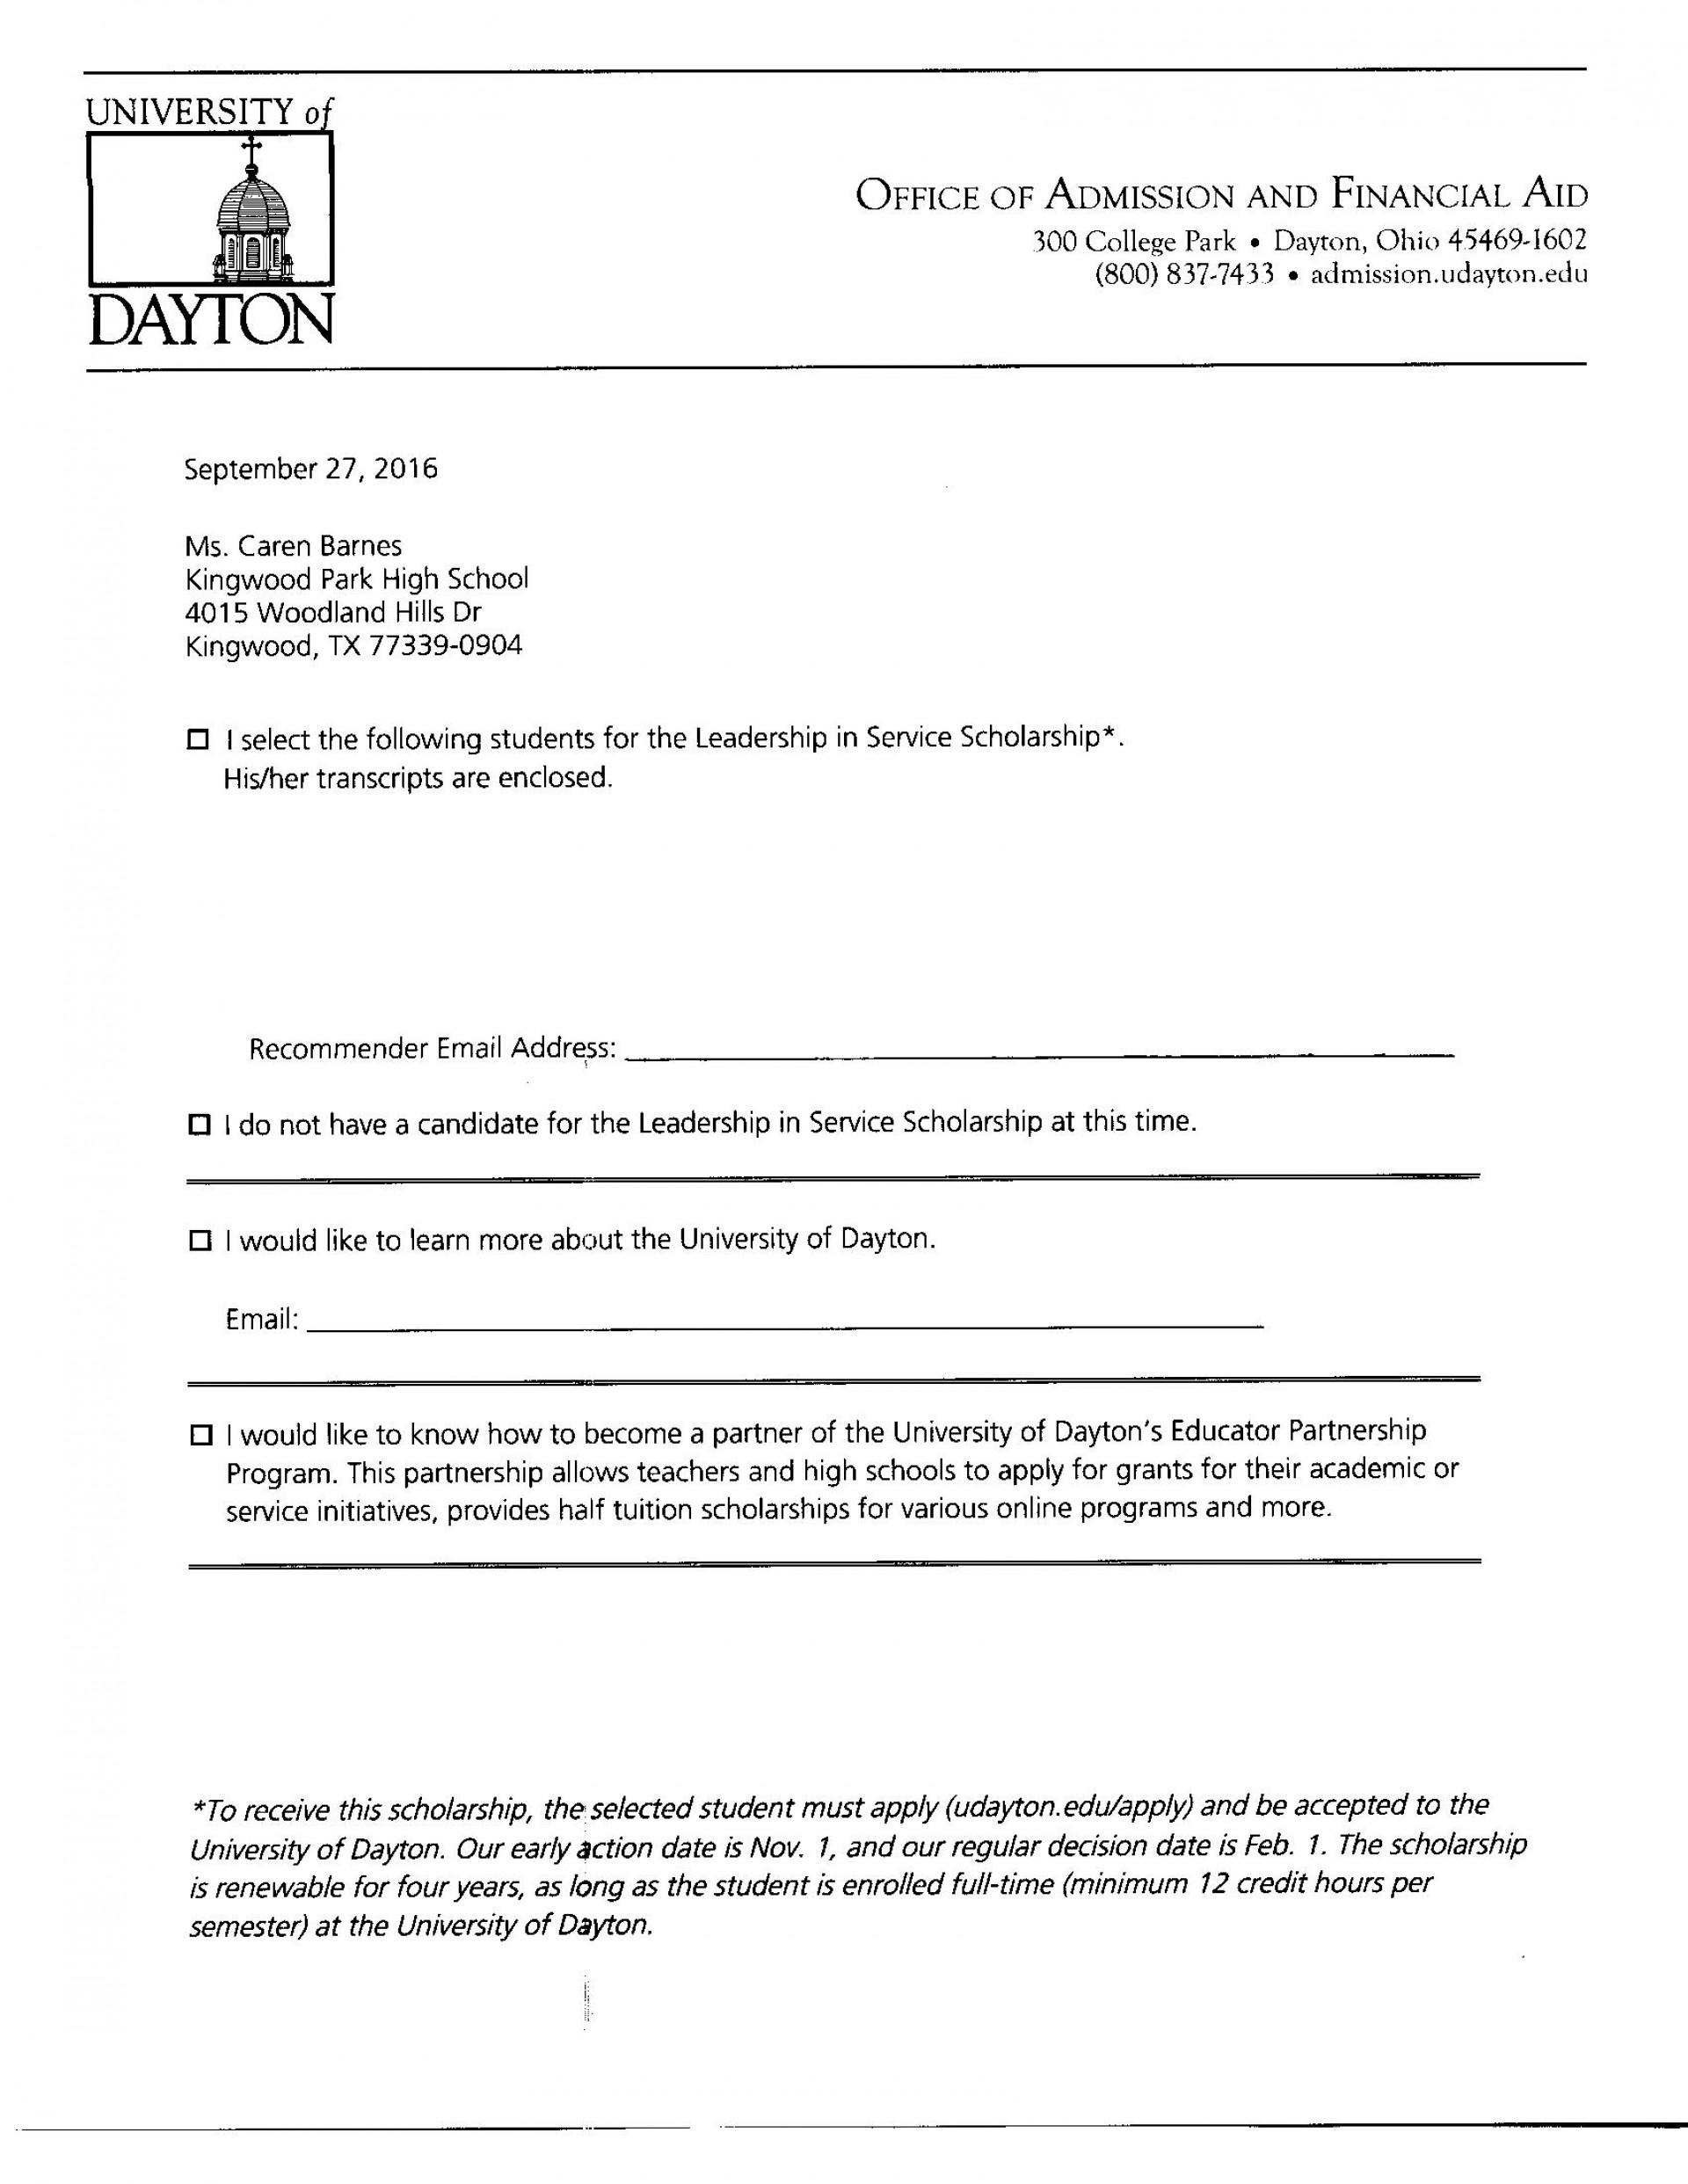 015 Gates Millenium Scholarship Essays Dayton Essay Staggering Millennium Questions 1920